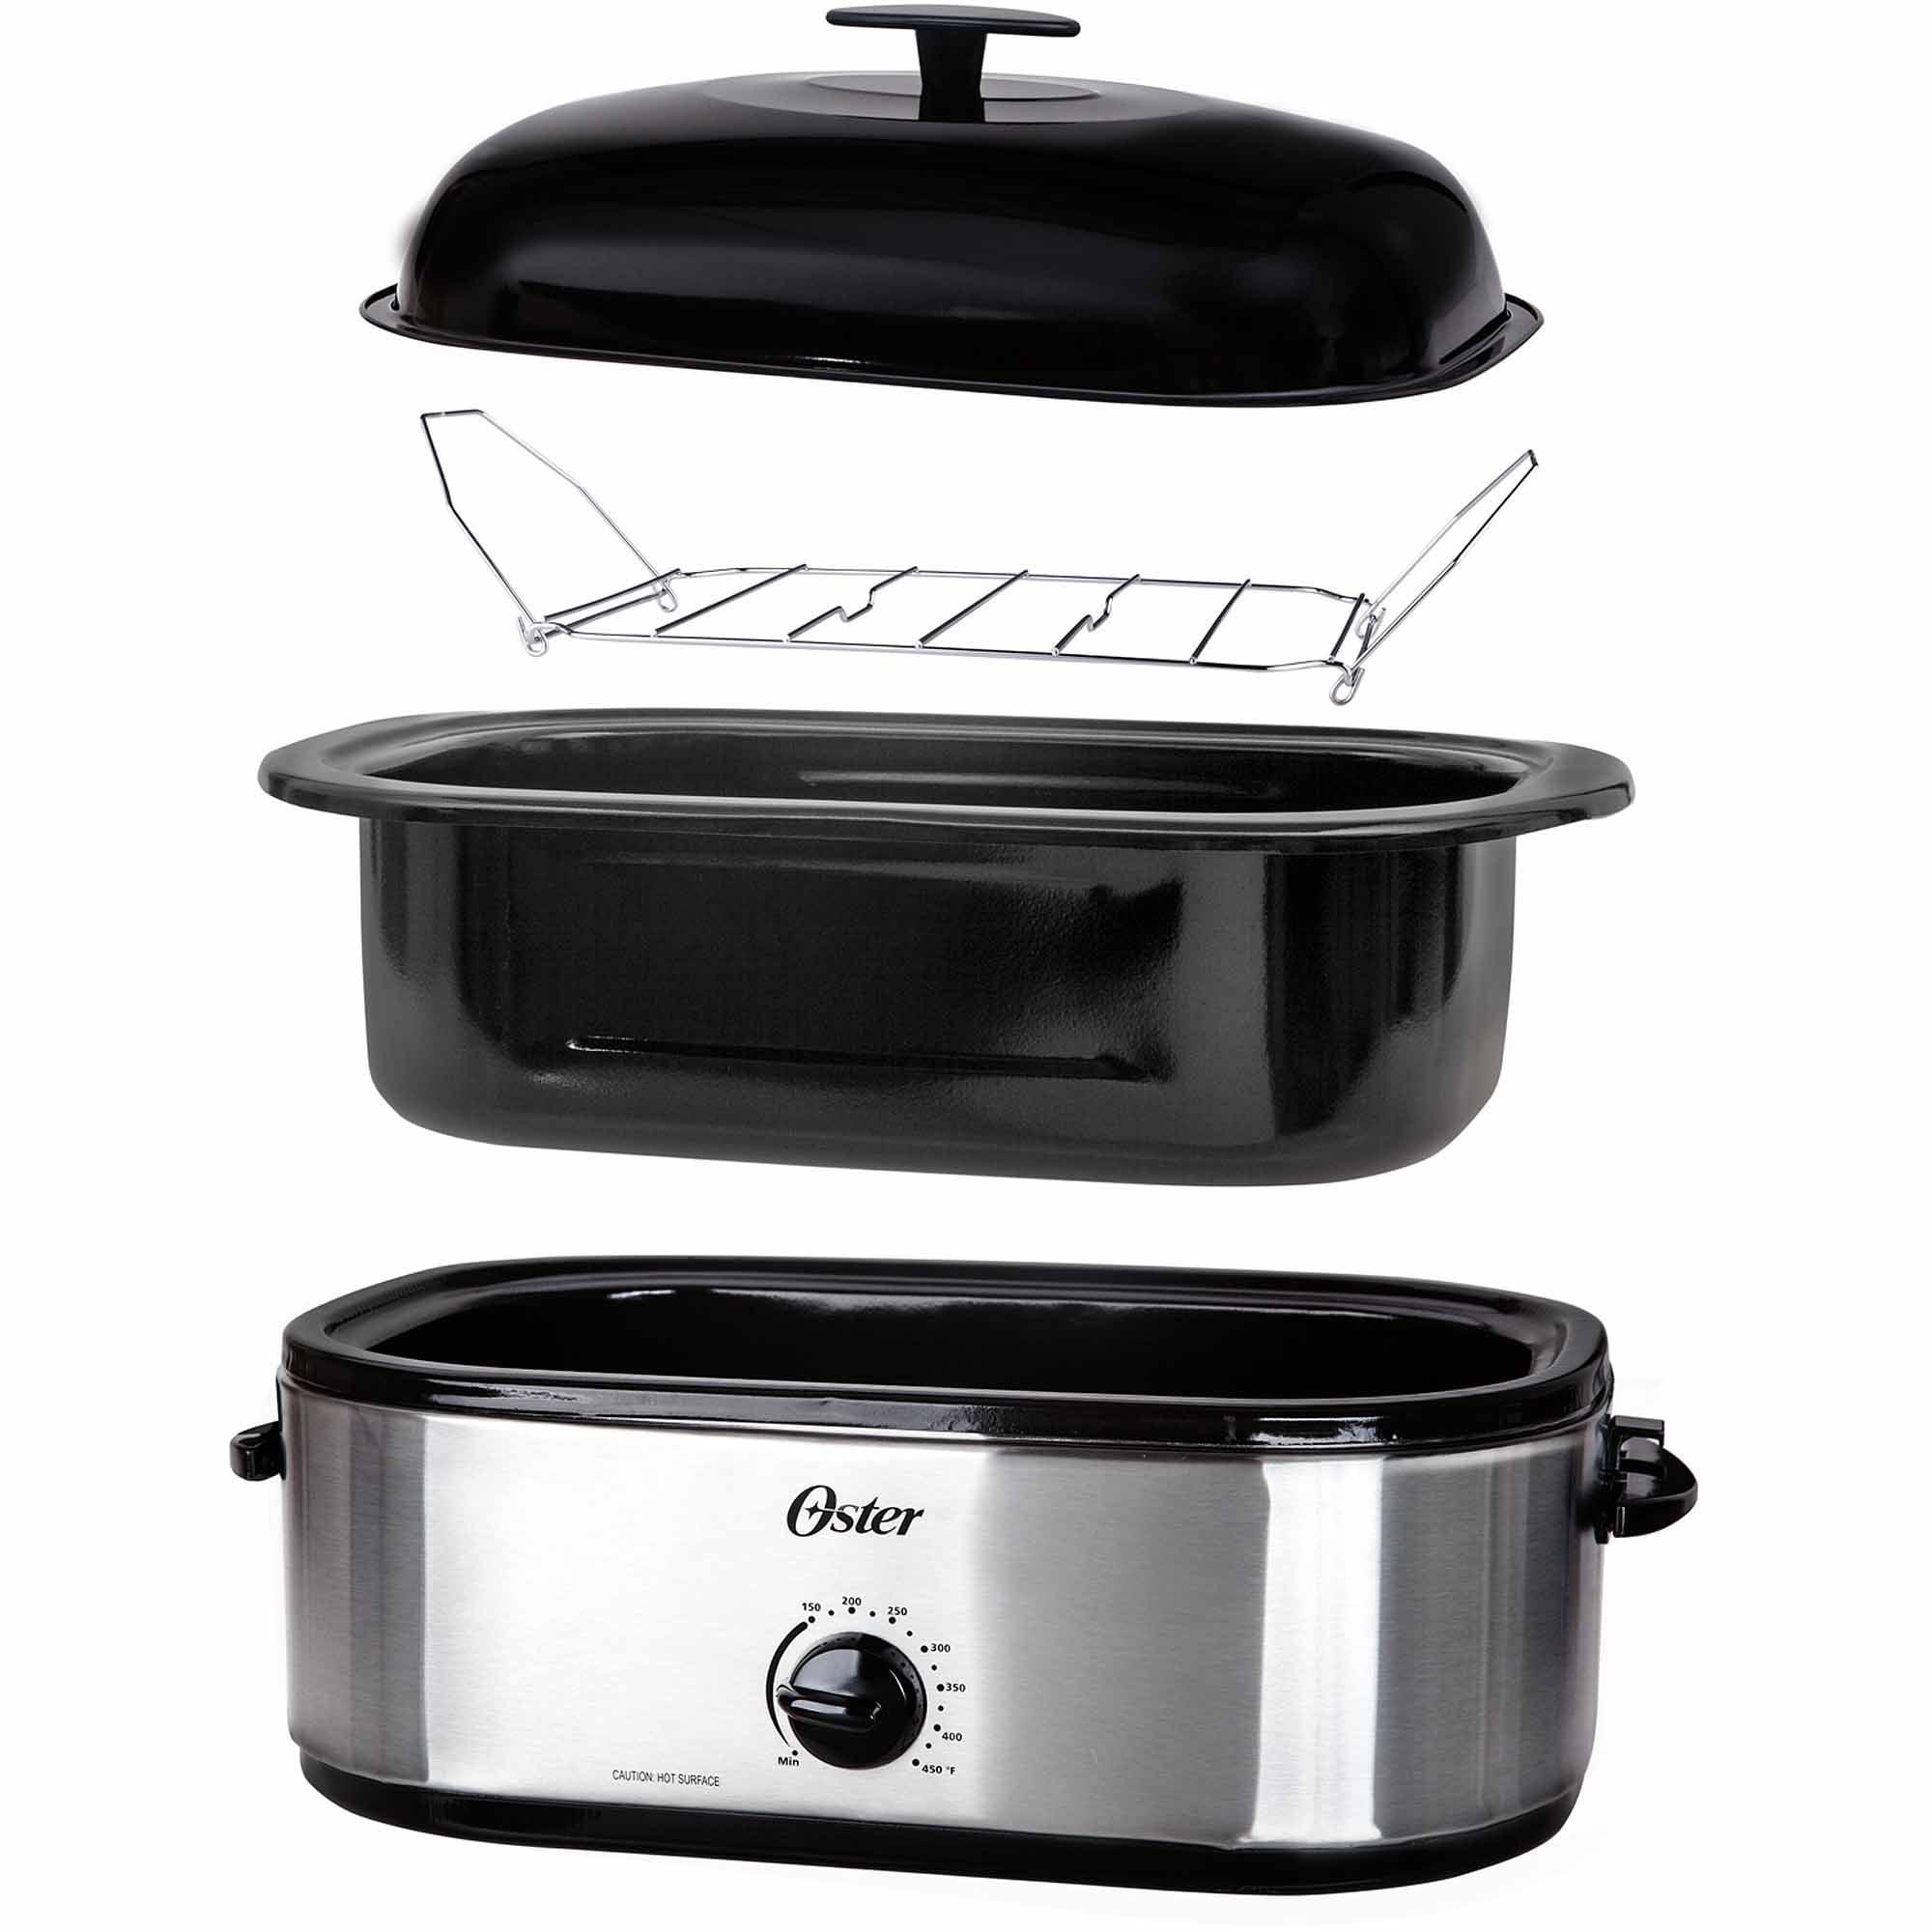 Oven & Toaster,Walmart.com